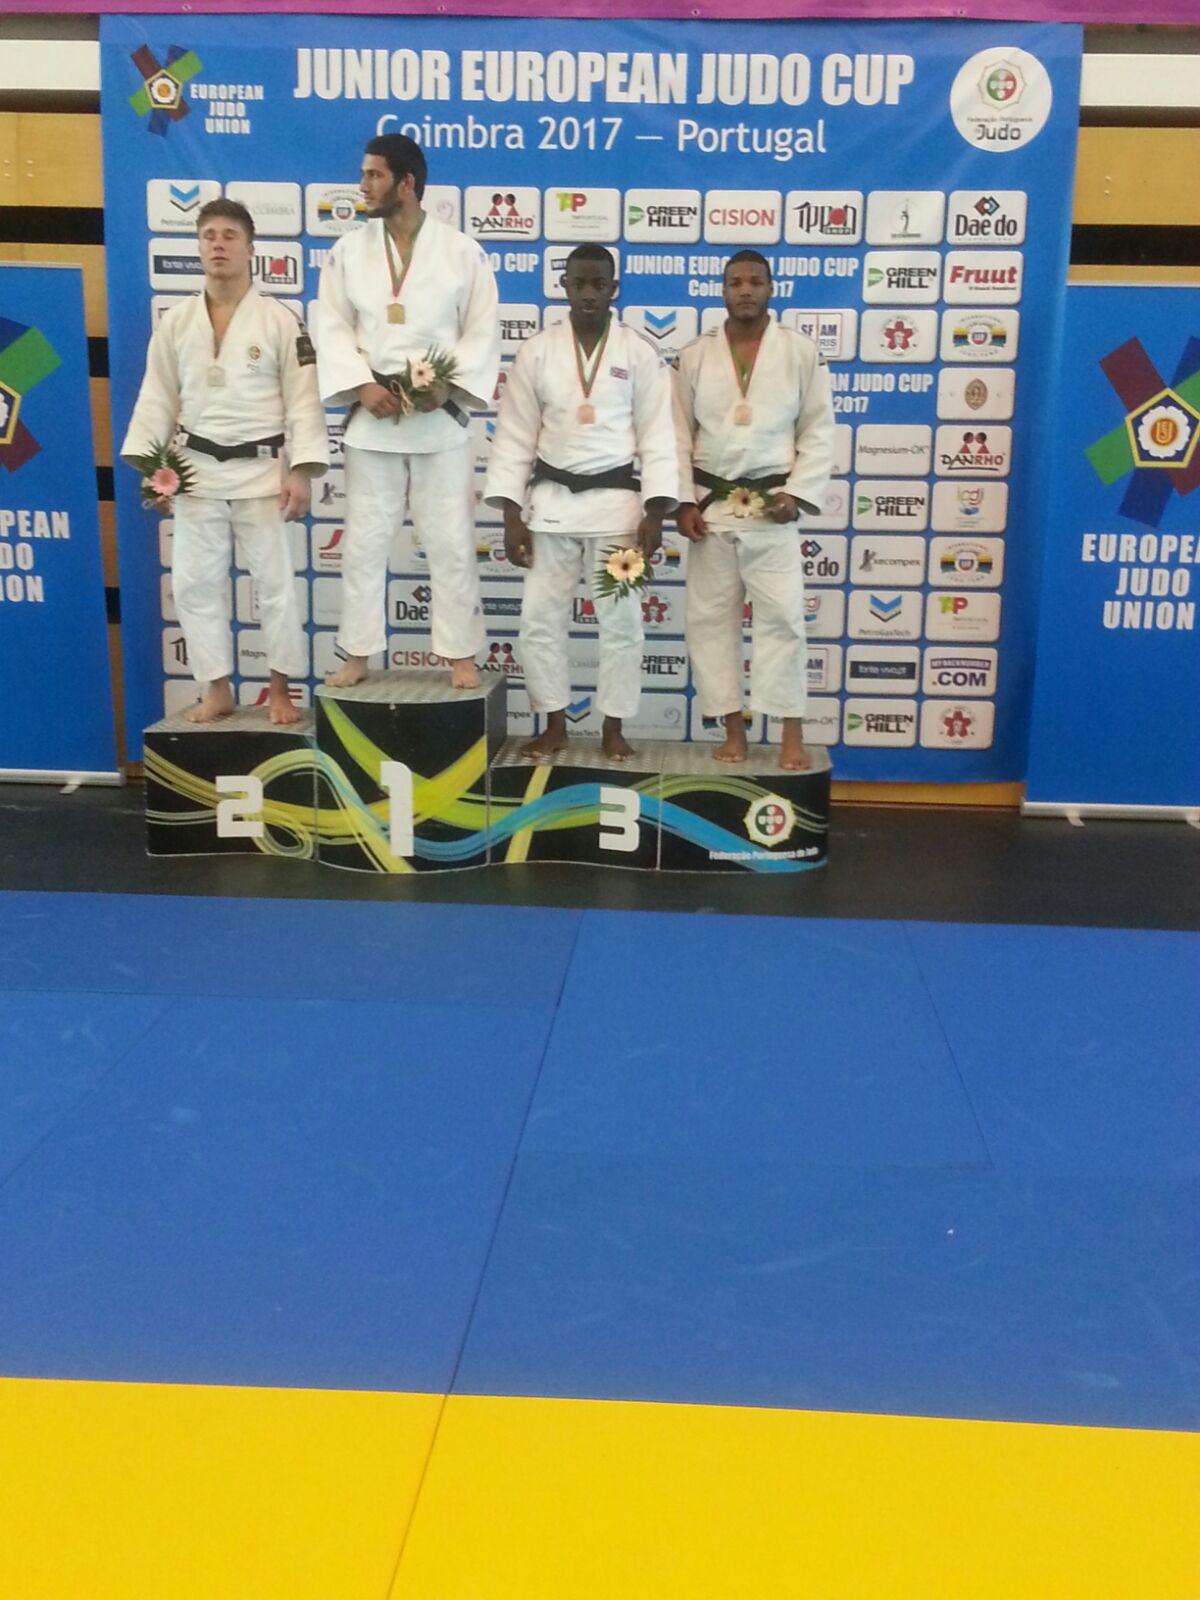 Nova y Florentino ganan bronce en Judo Europeo